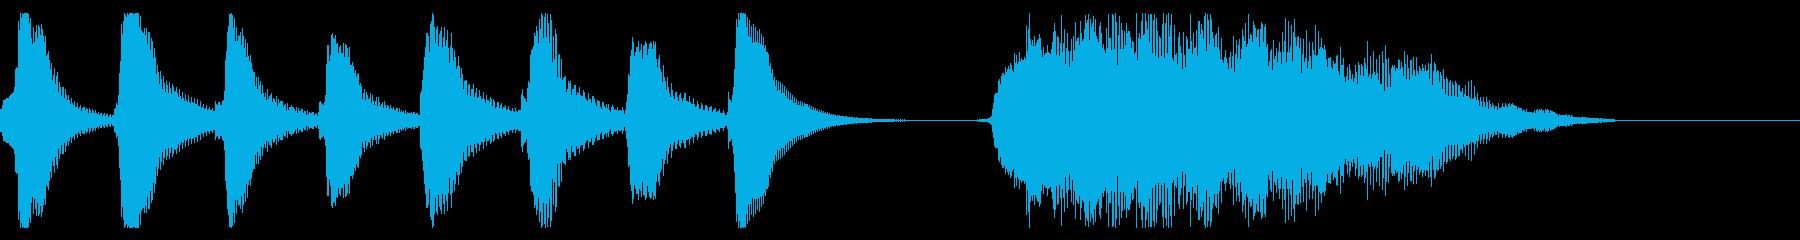 Marinicaの再生済みの波形